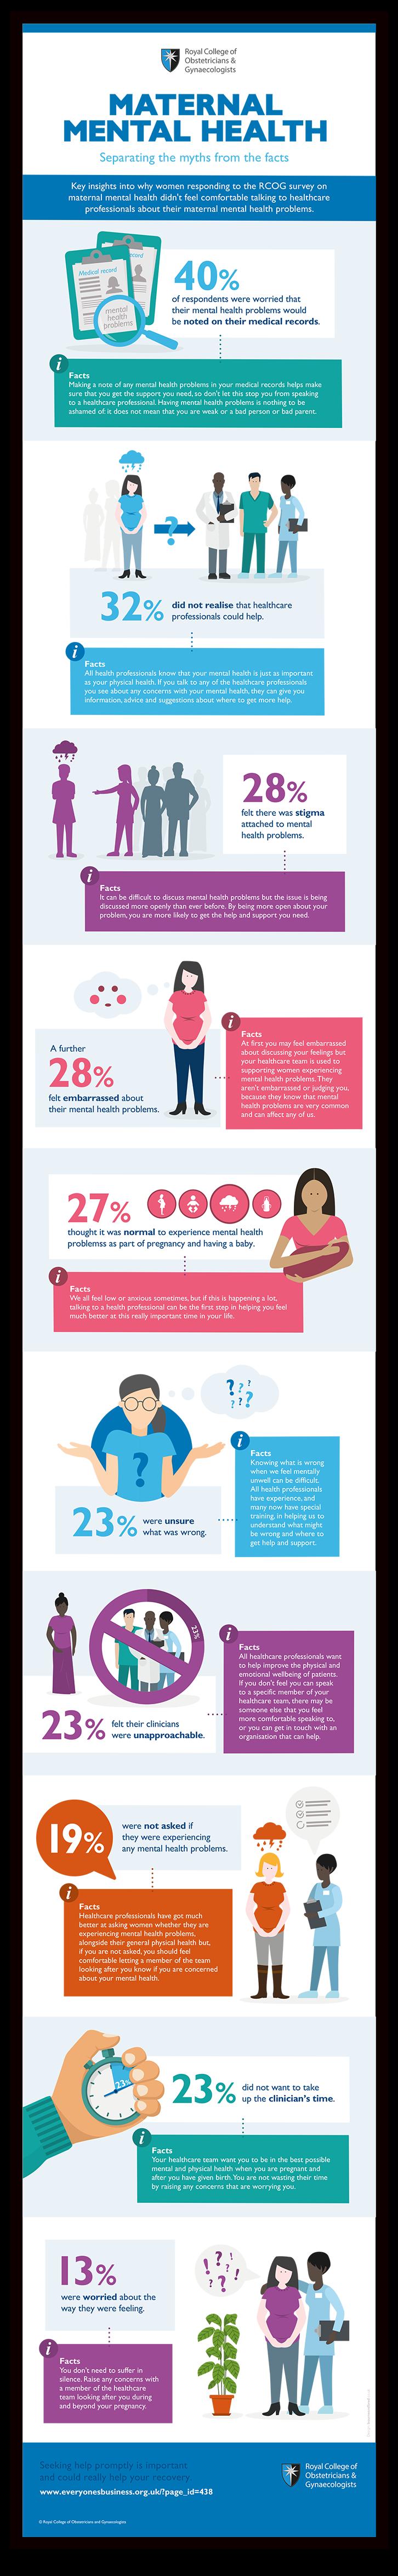 RCOG_Infographic_Full